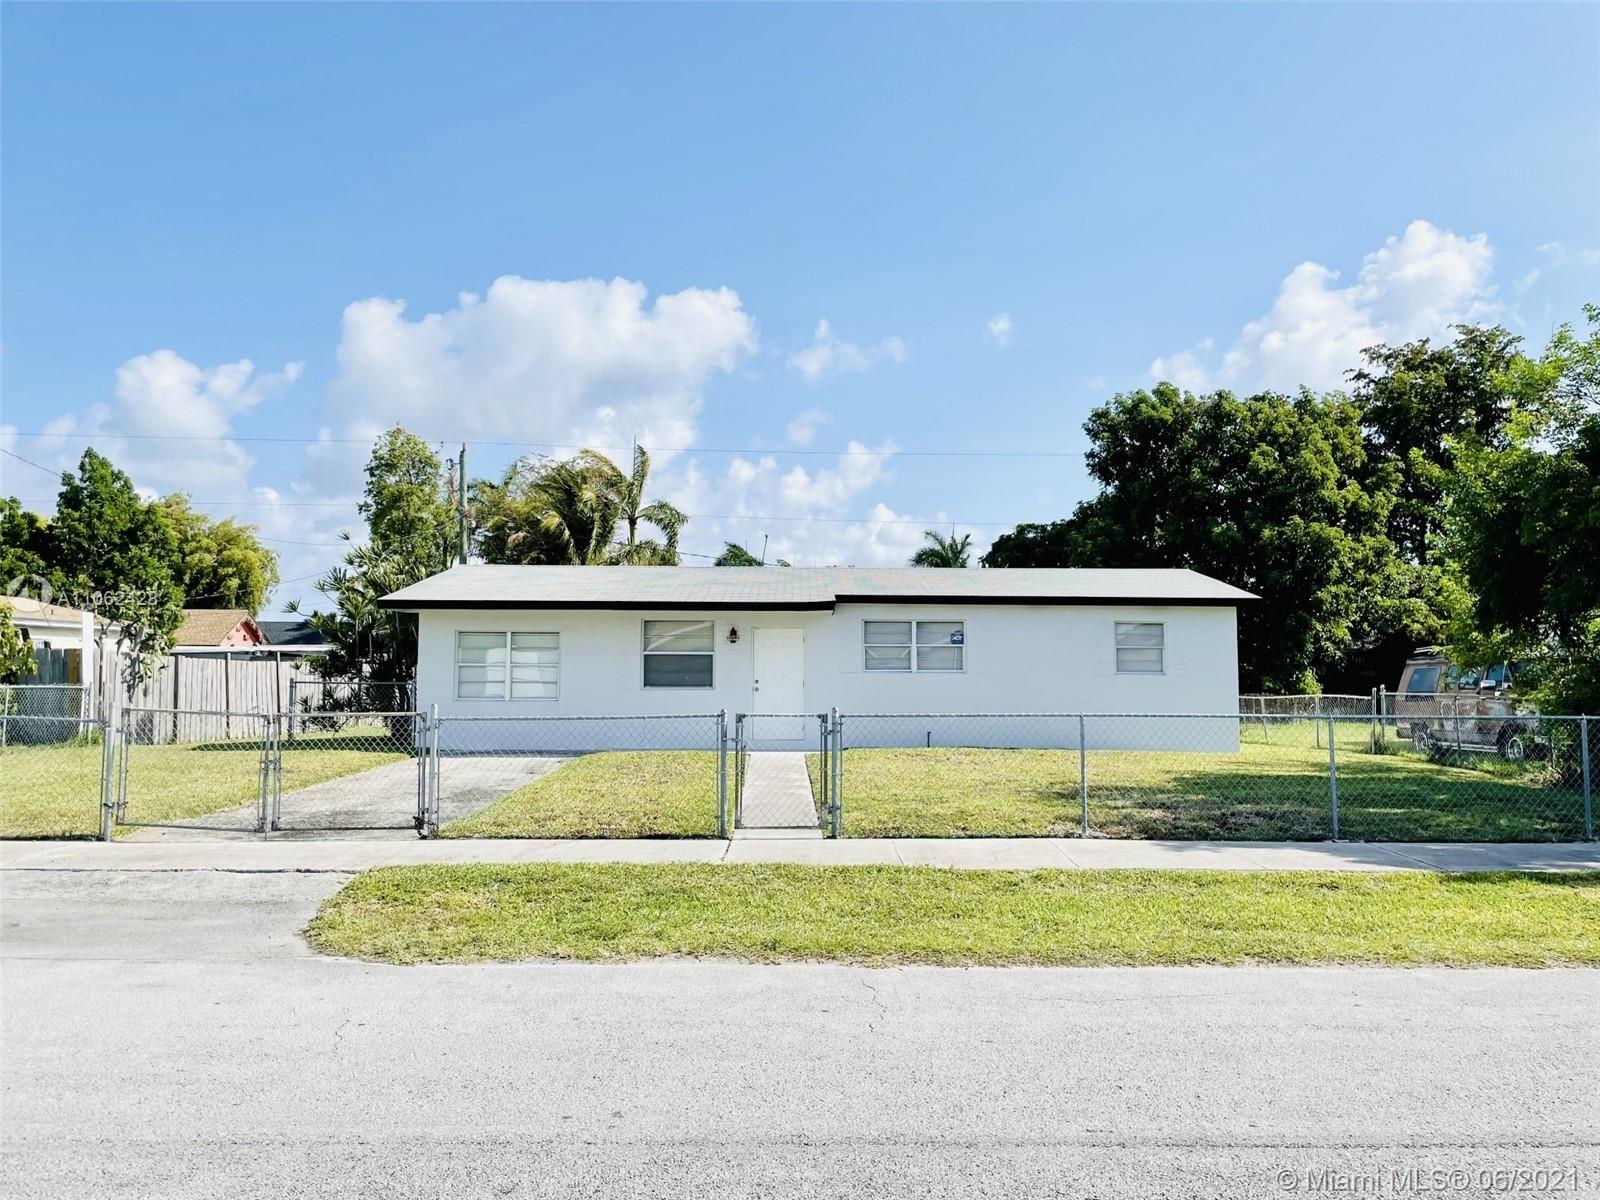 11031 SW 222nd Ter, Miami, FL 33170 - #: A11062428